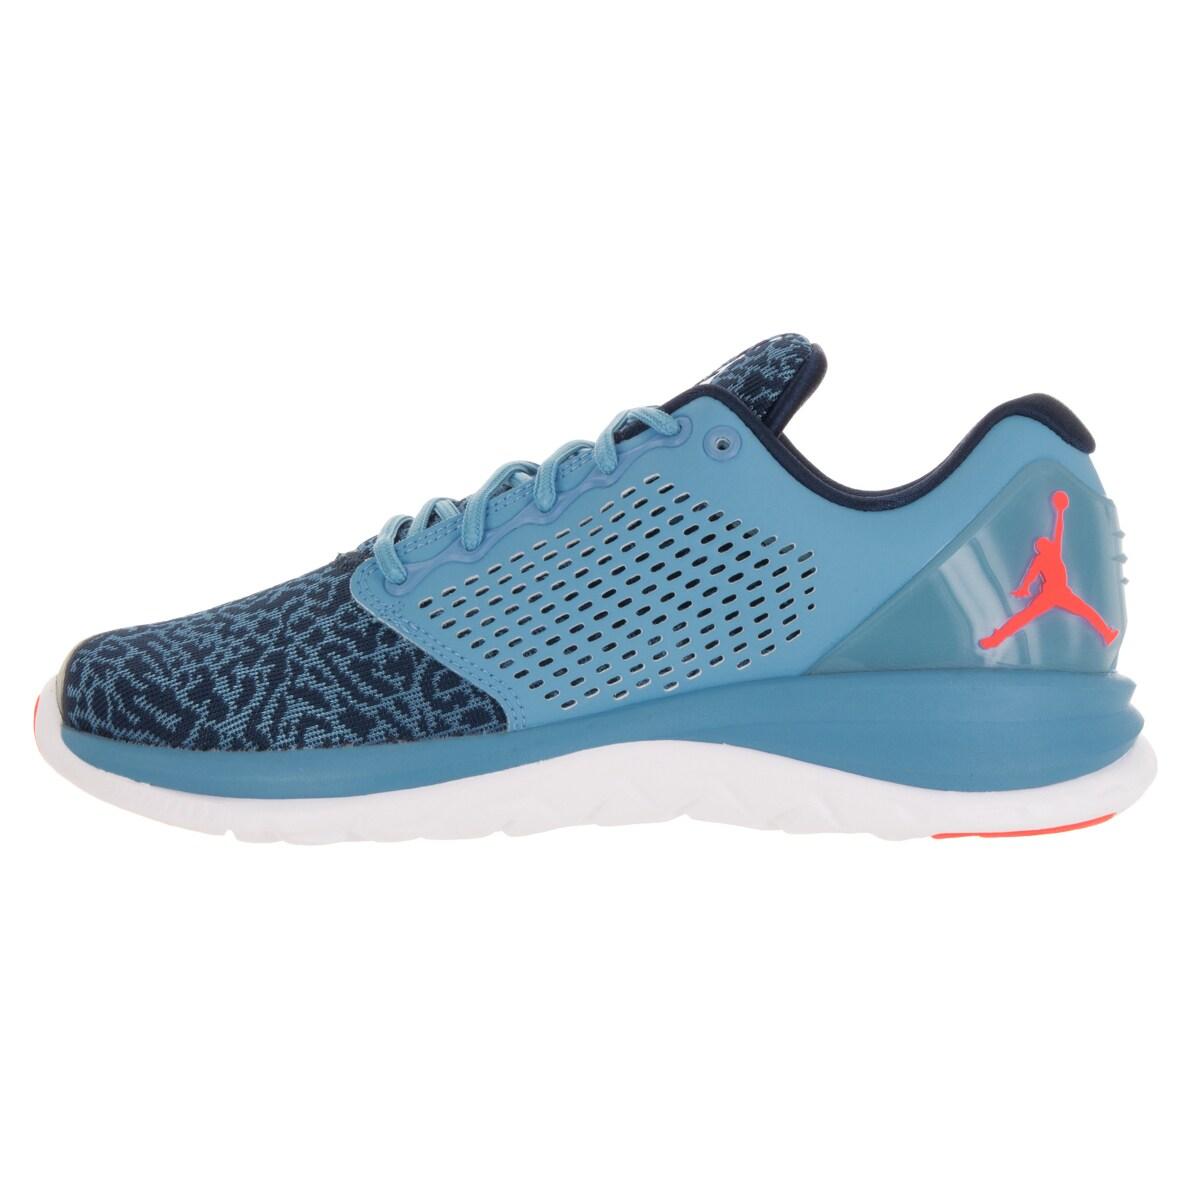 dc8e218d6a2d Shop Nike Jordan Men s Jordan Trainer St University Blue Infrared  23 Midnight Nv Training Shoe - Free Shipping Today - Overstock - 12318215